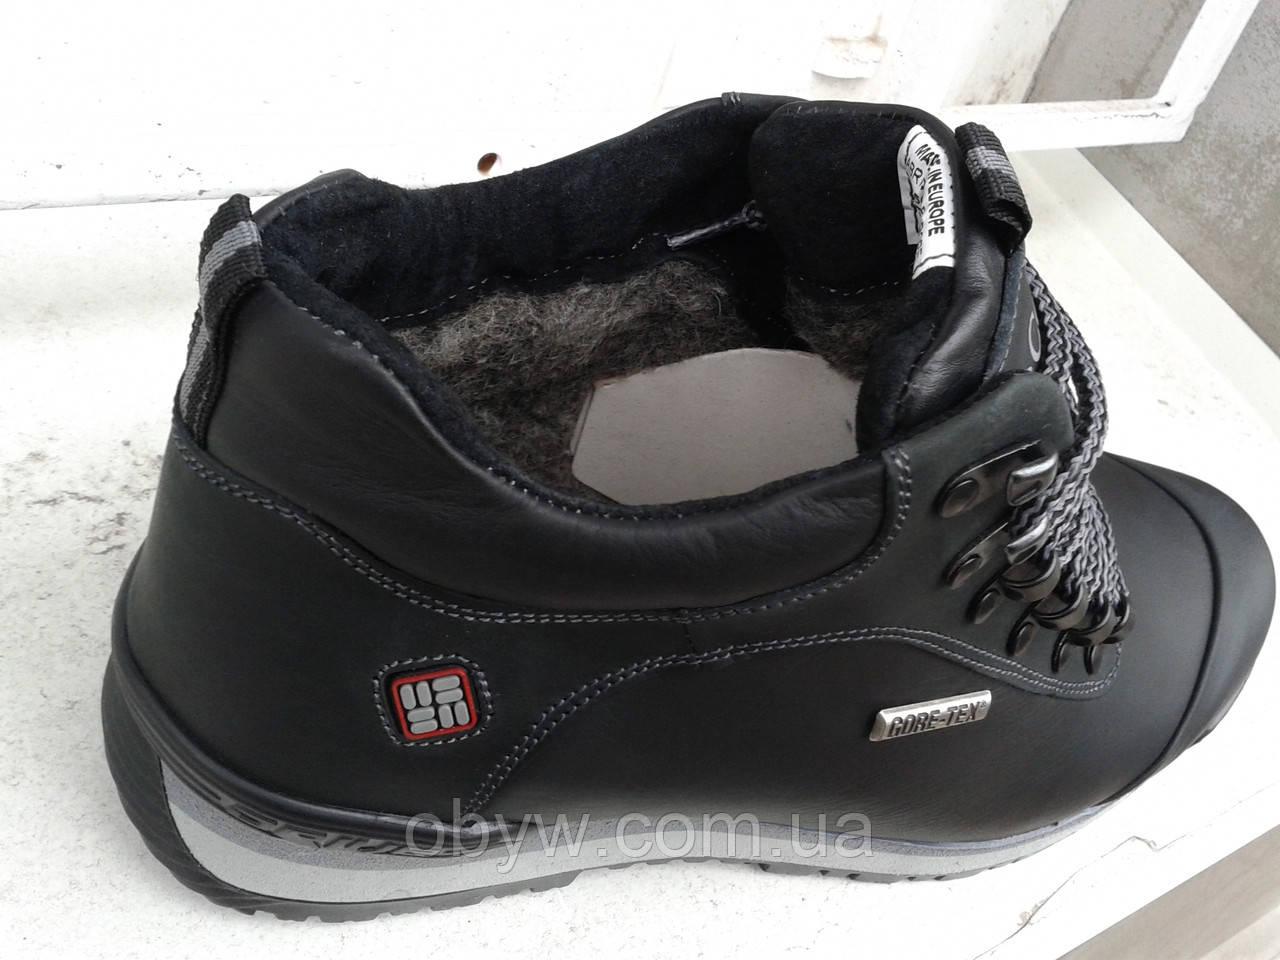 Cаlambia кожаные кроссовки зима